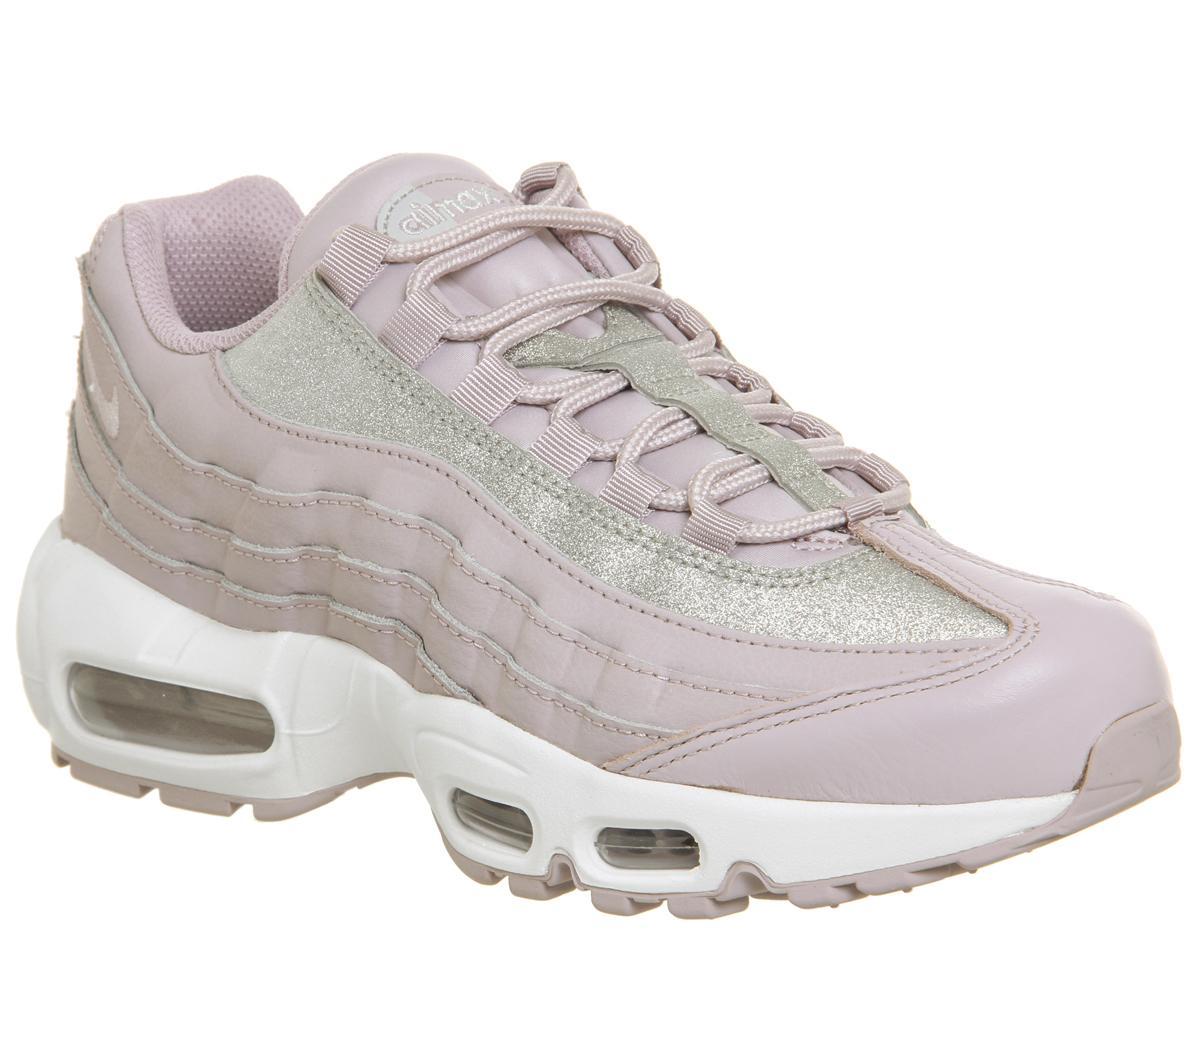 Nike Air Max 95 Trainers Glitter Pink - Sneaker damen